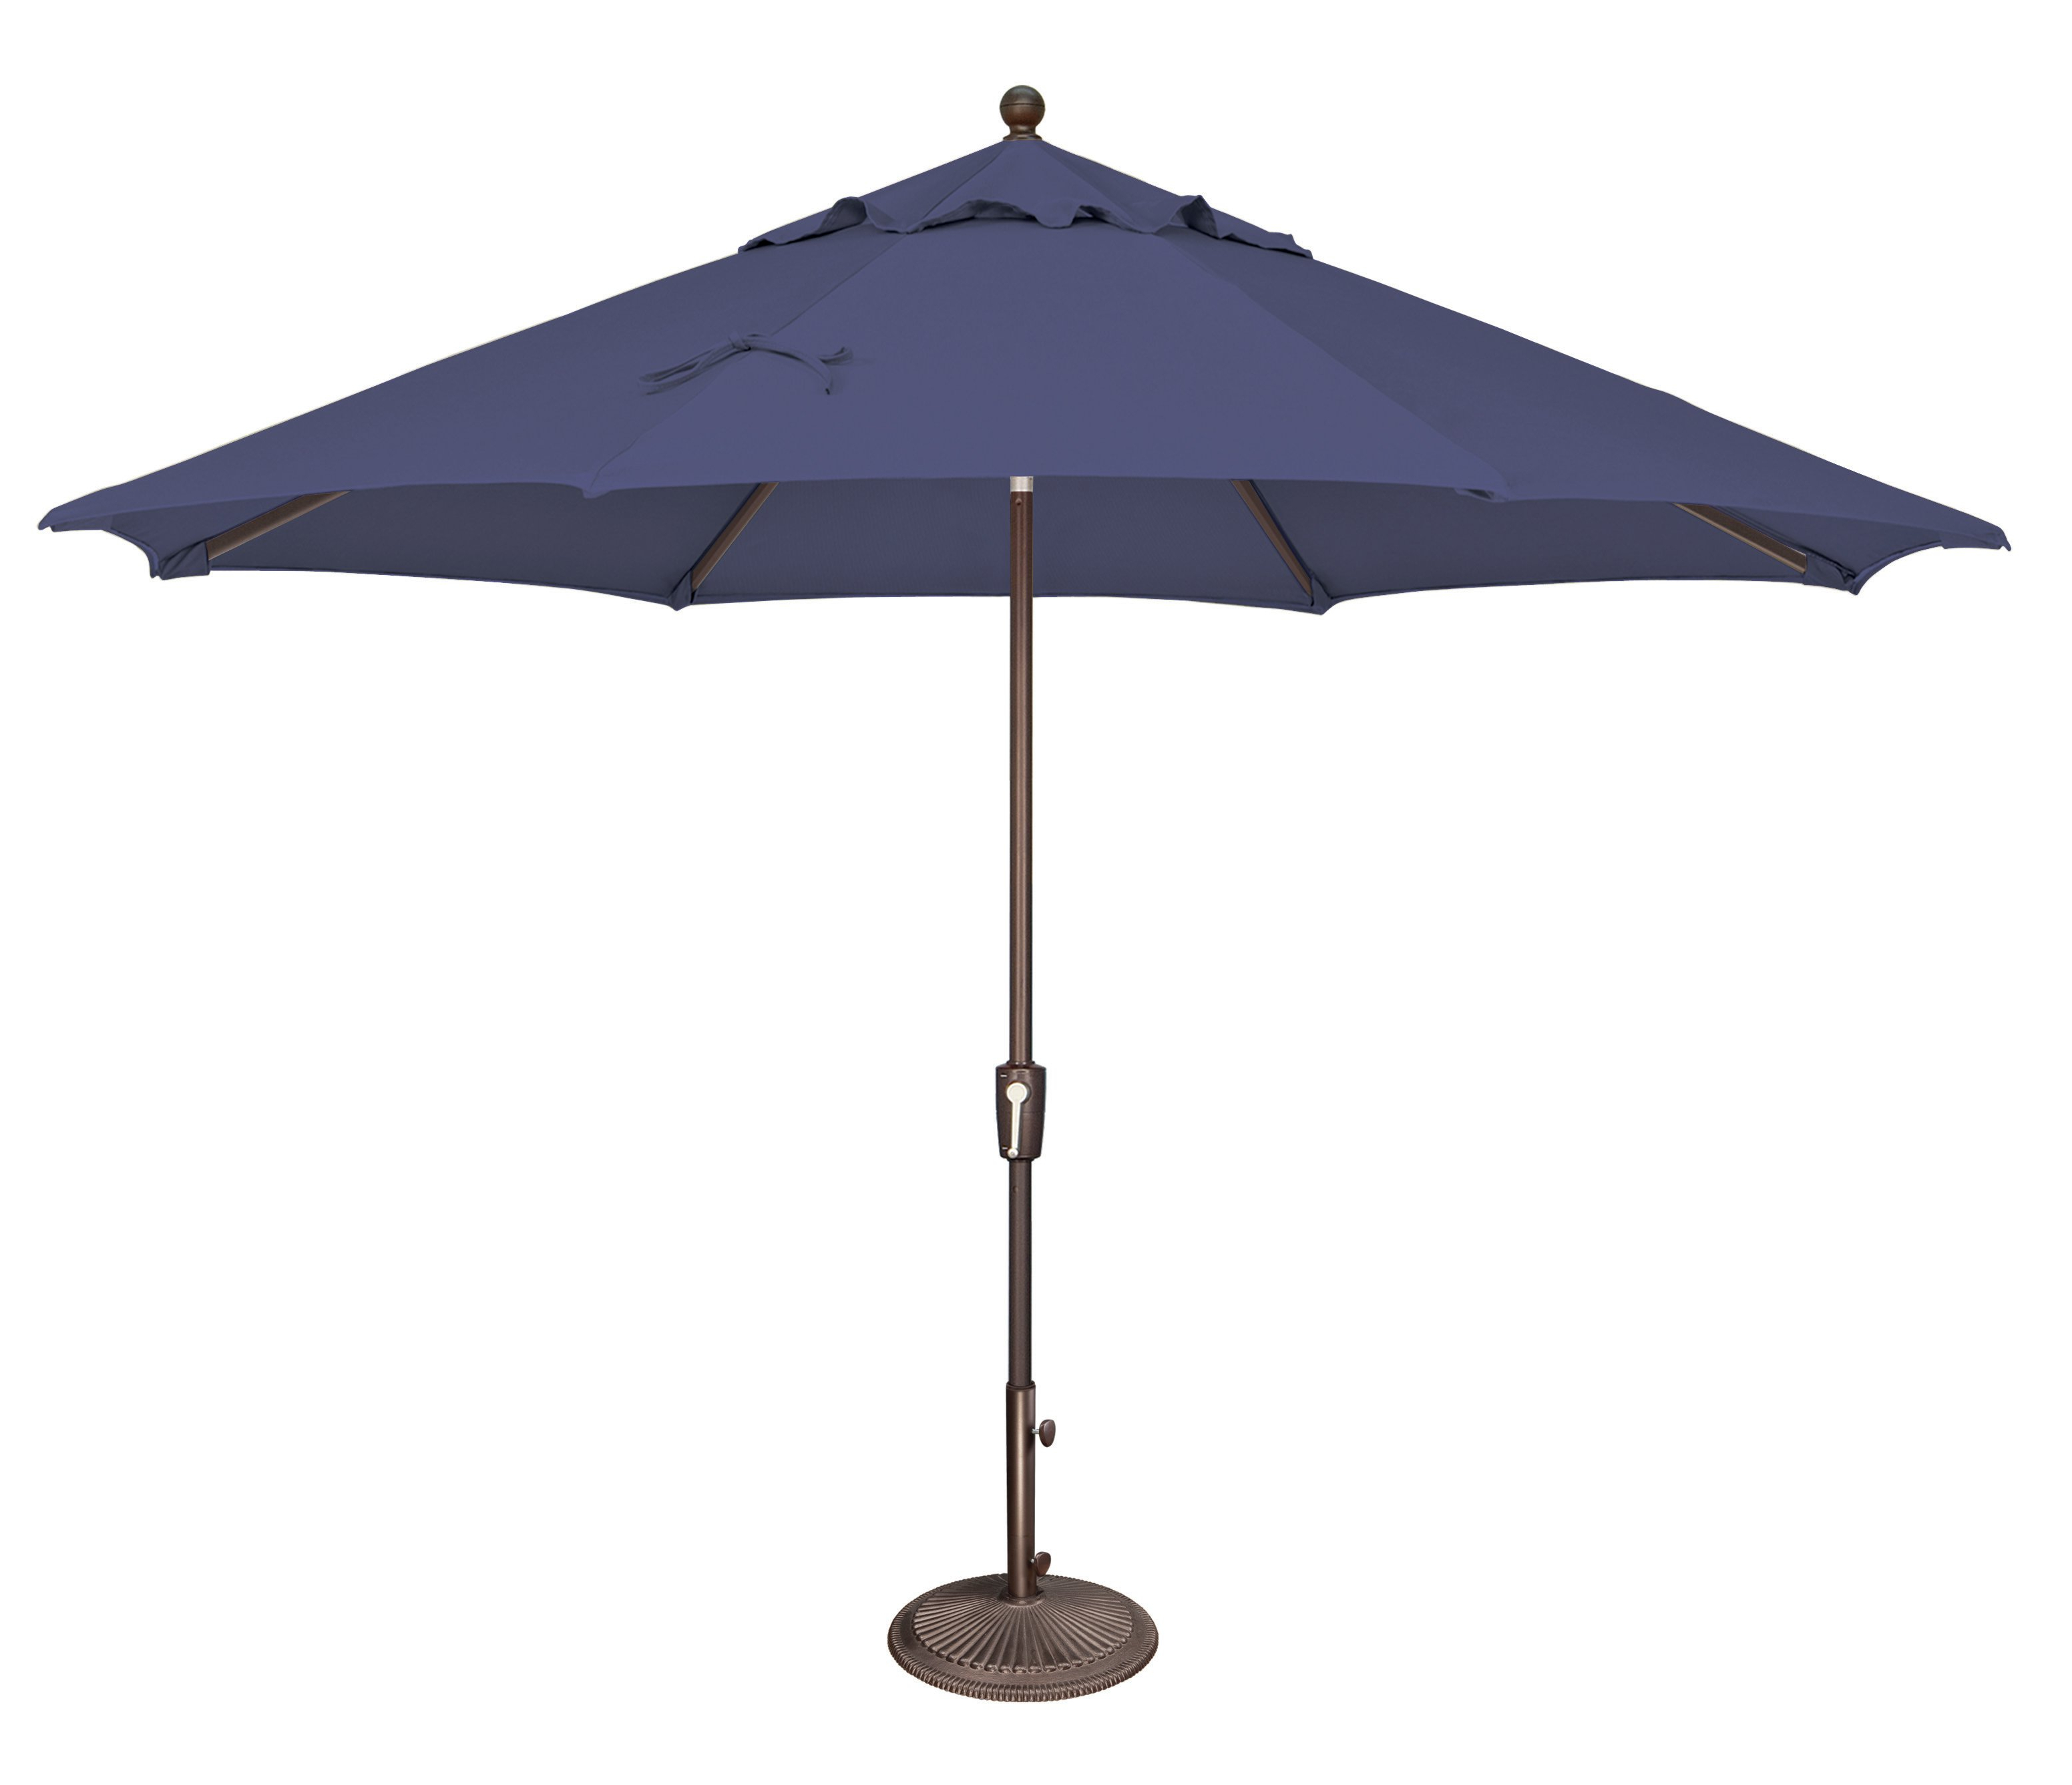 Launceston 11' Market Umbrella With Well Known Mullaney Market Umbrellas (View 5 of 20)